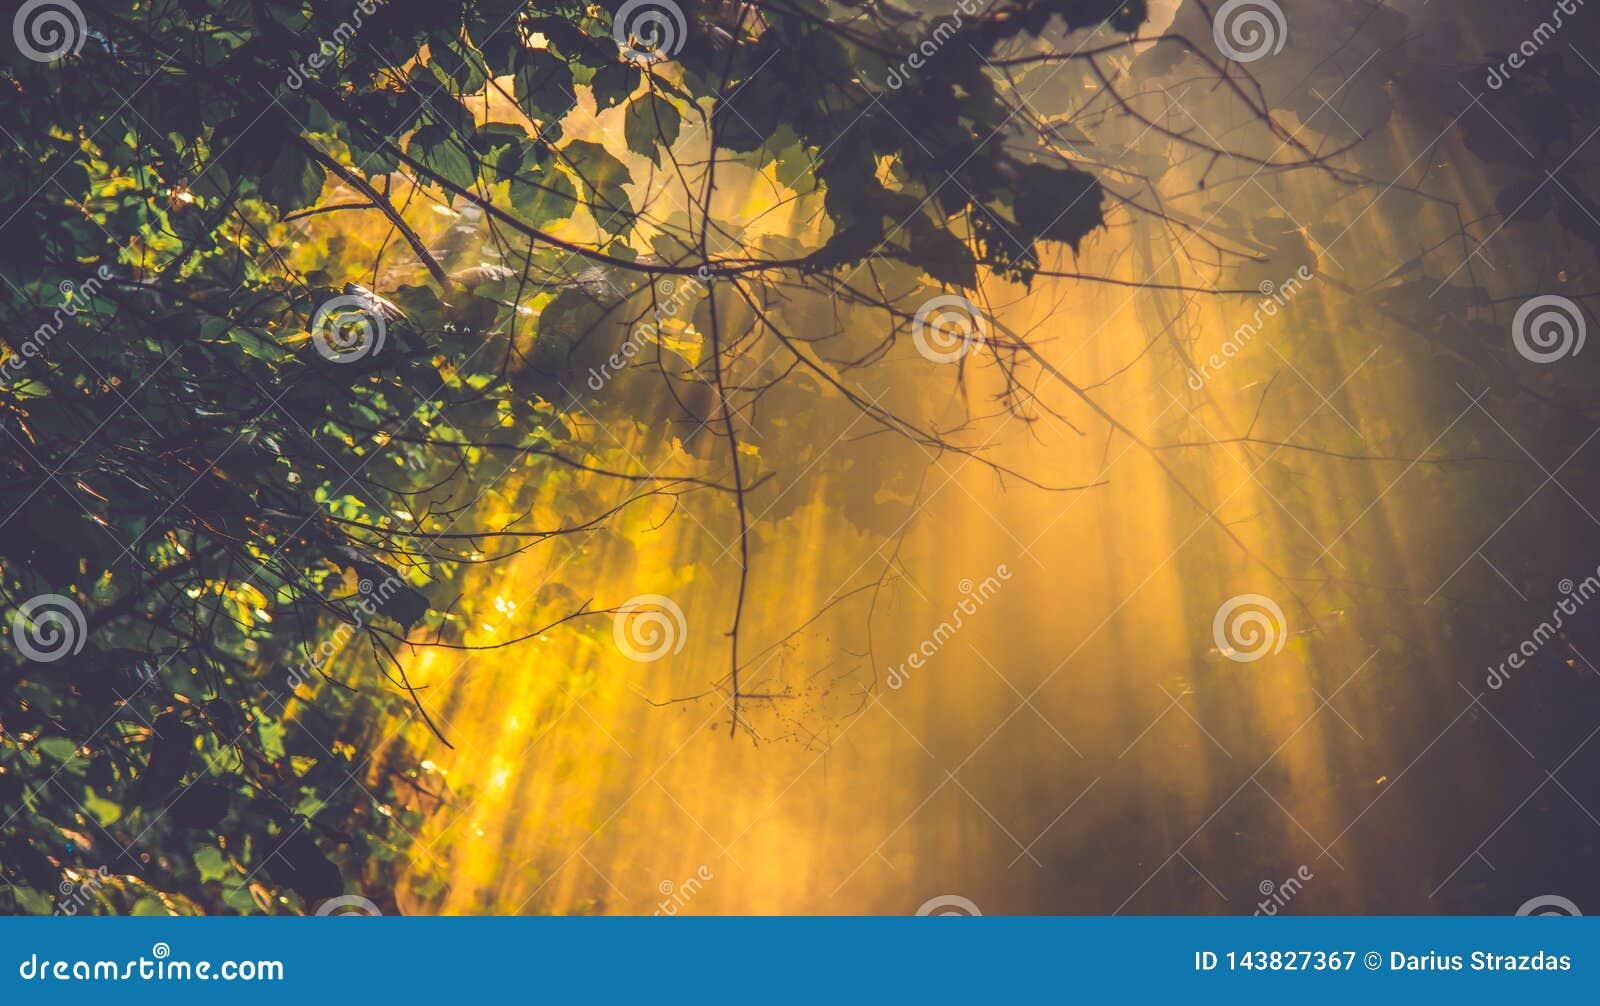 Sun light and mist